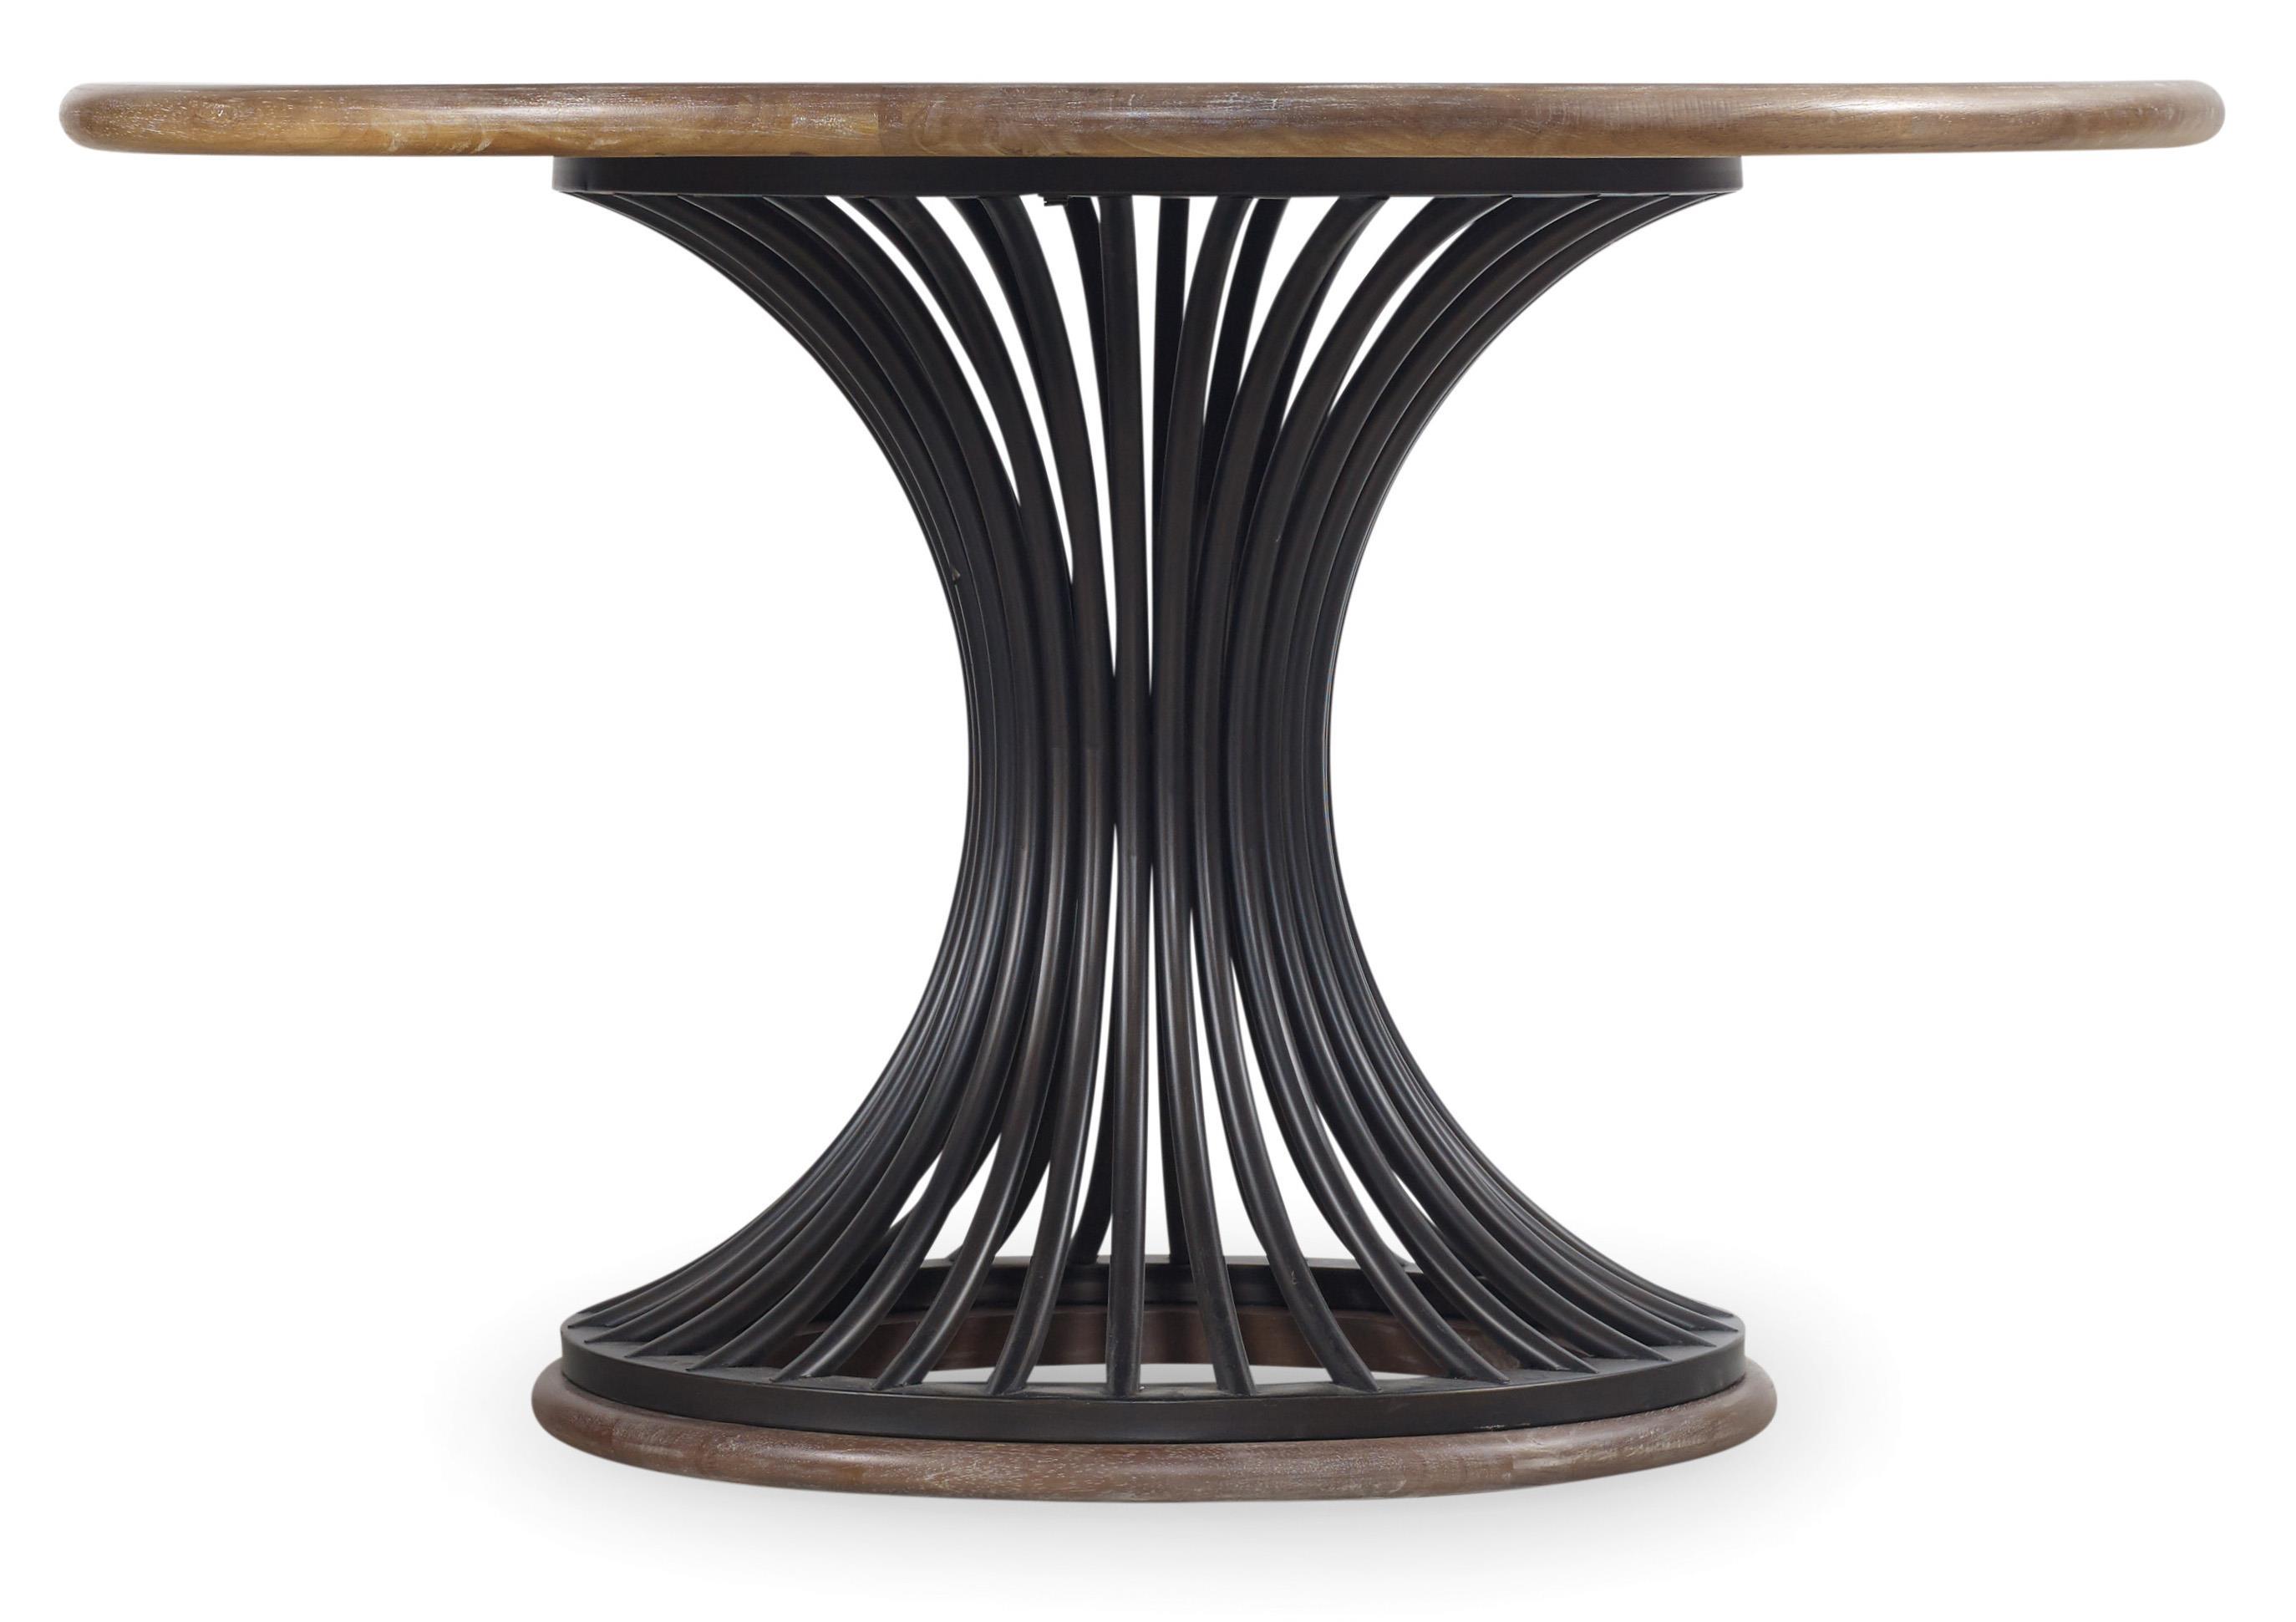 Hooker Furniture Studio 7H Cinch Round Dining Table - Item Number: 5382-75203